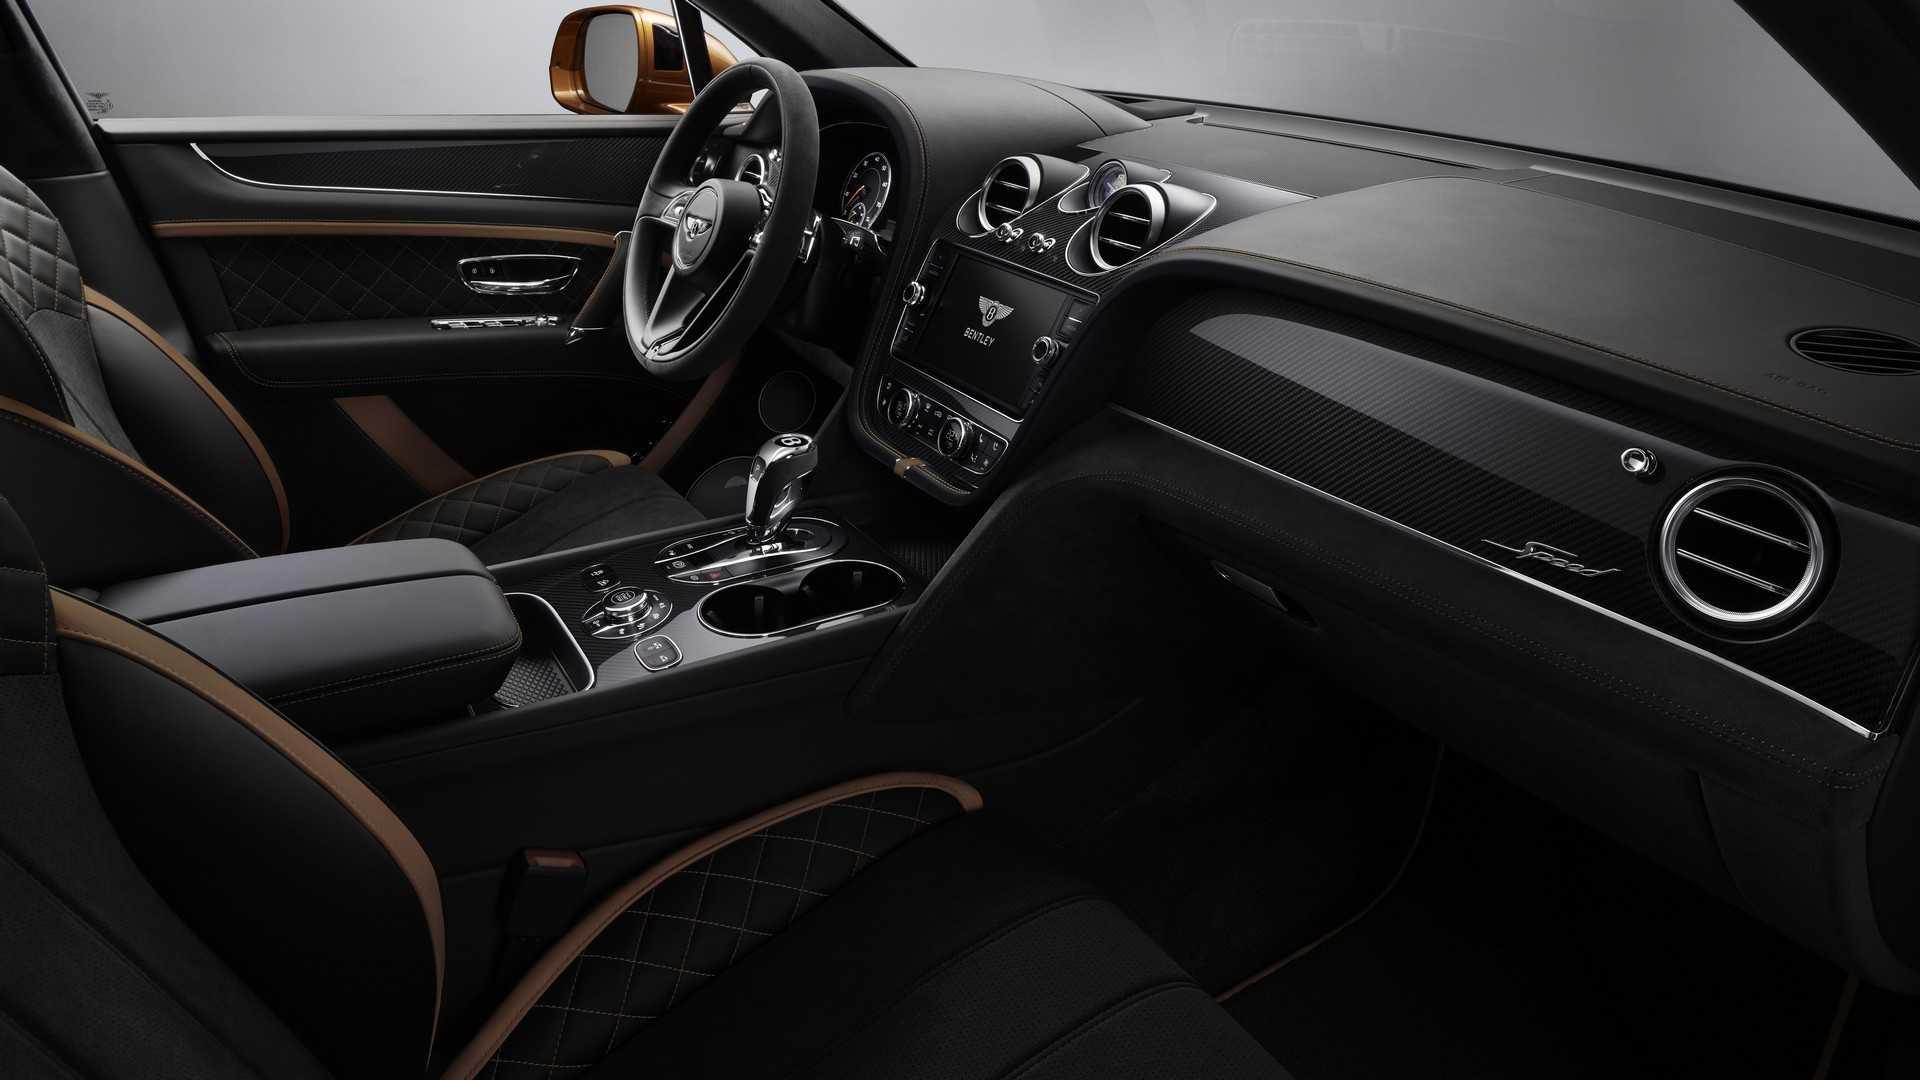 Bentley Bentayga Speed (W12)